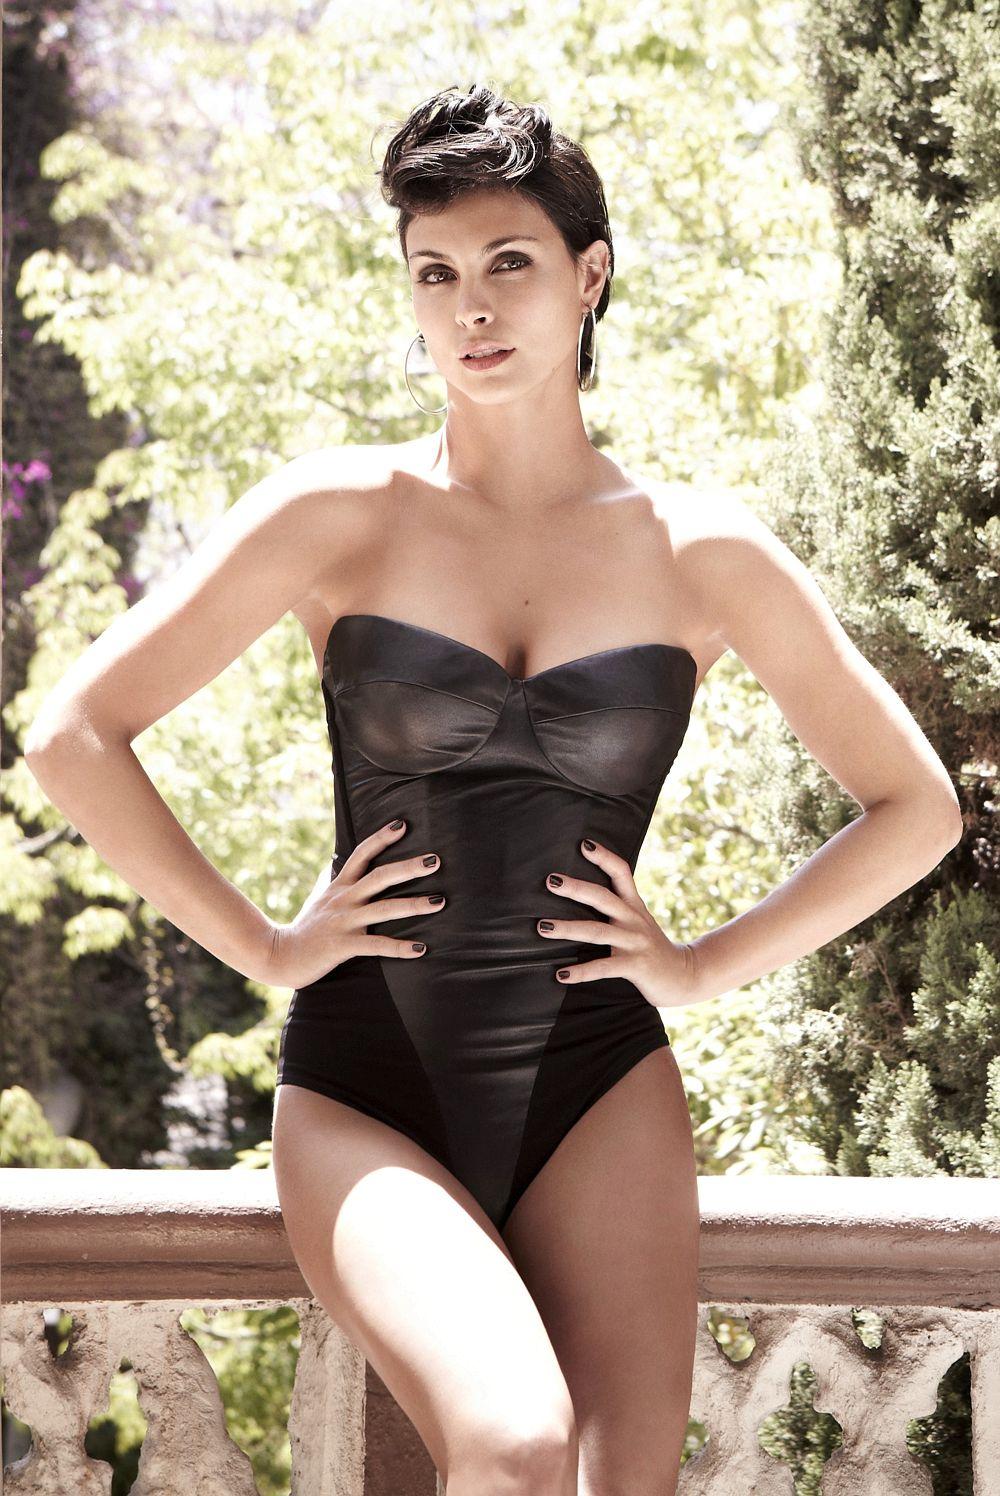 morena-baccarin-topless